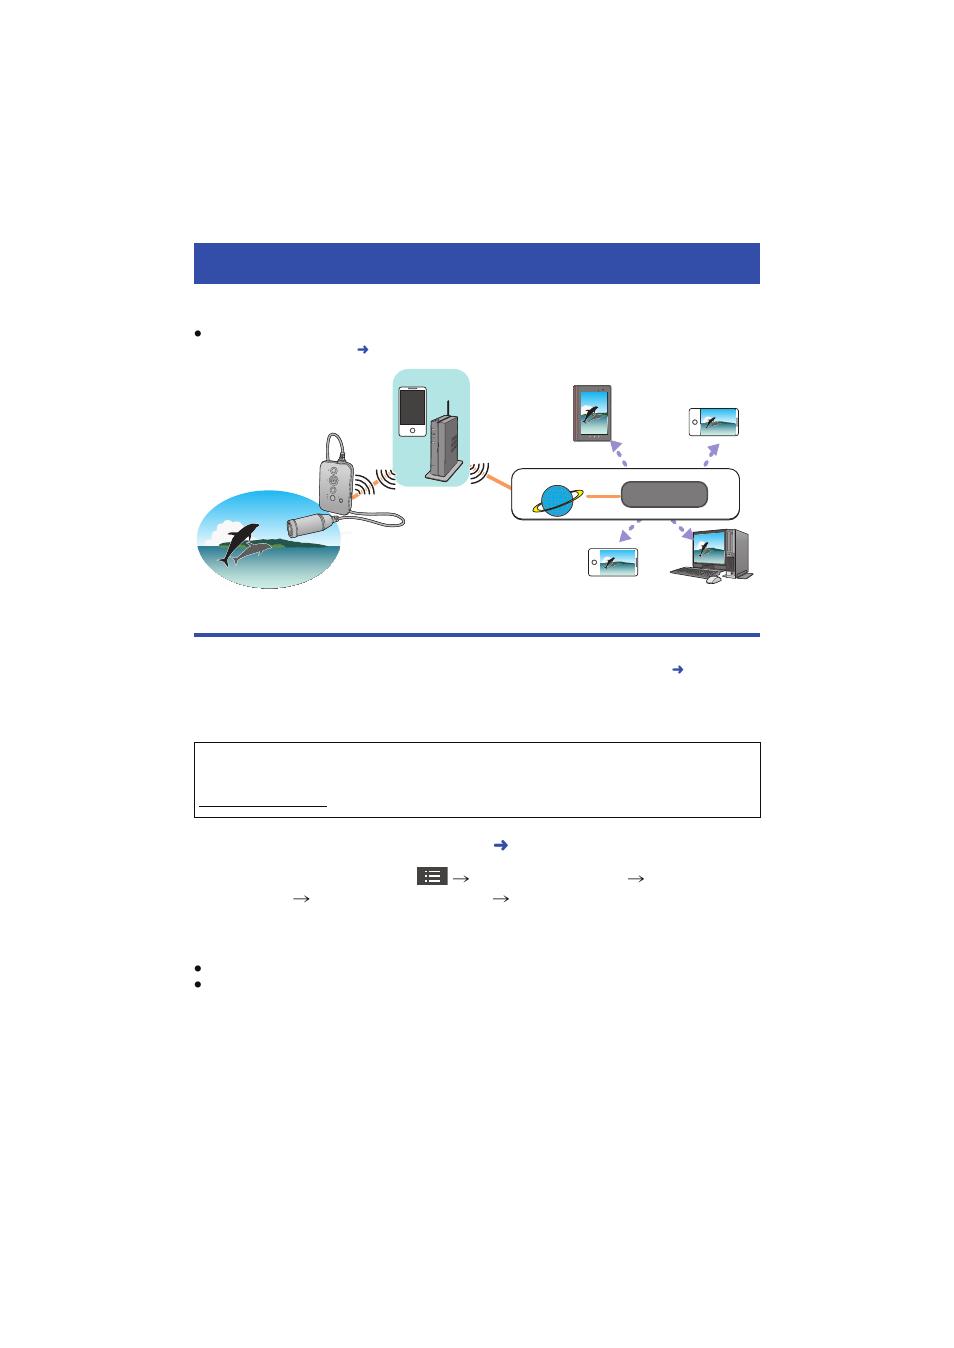 Live broadcasting, Setting for live broadcasting, L 37